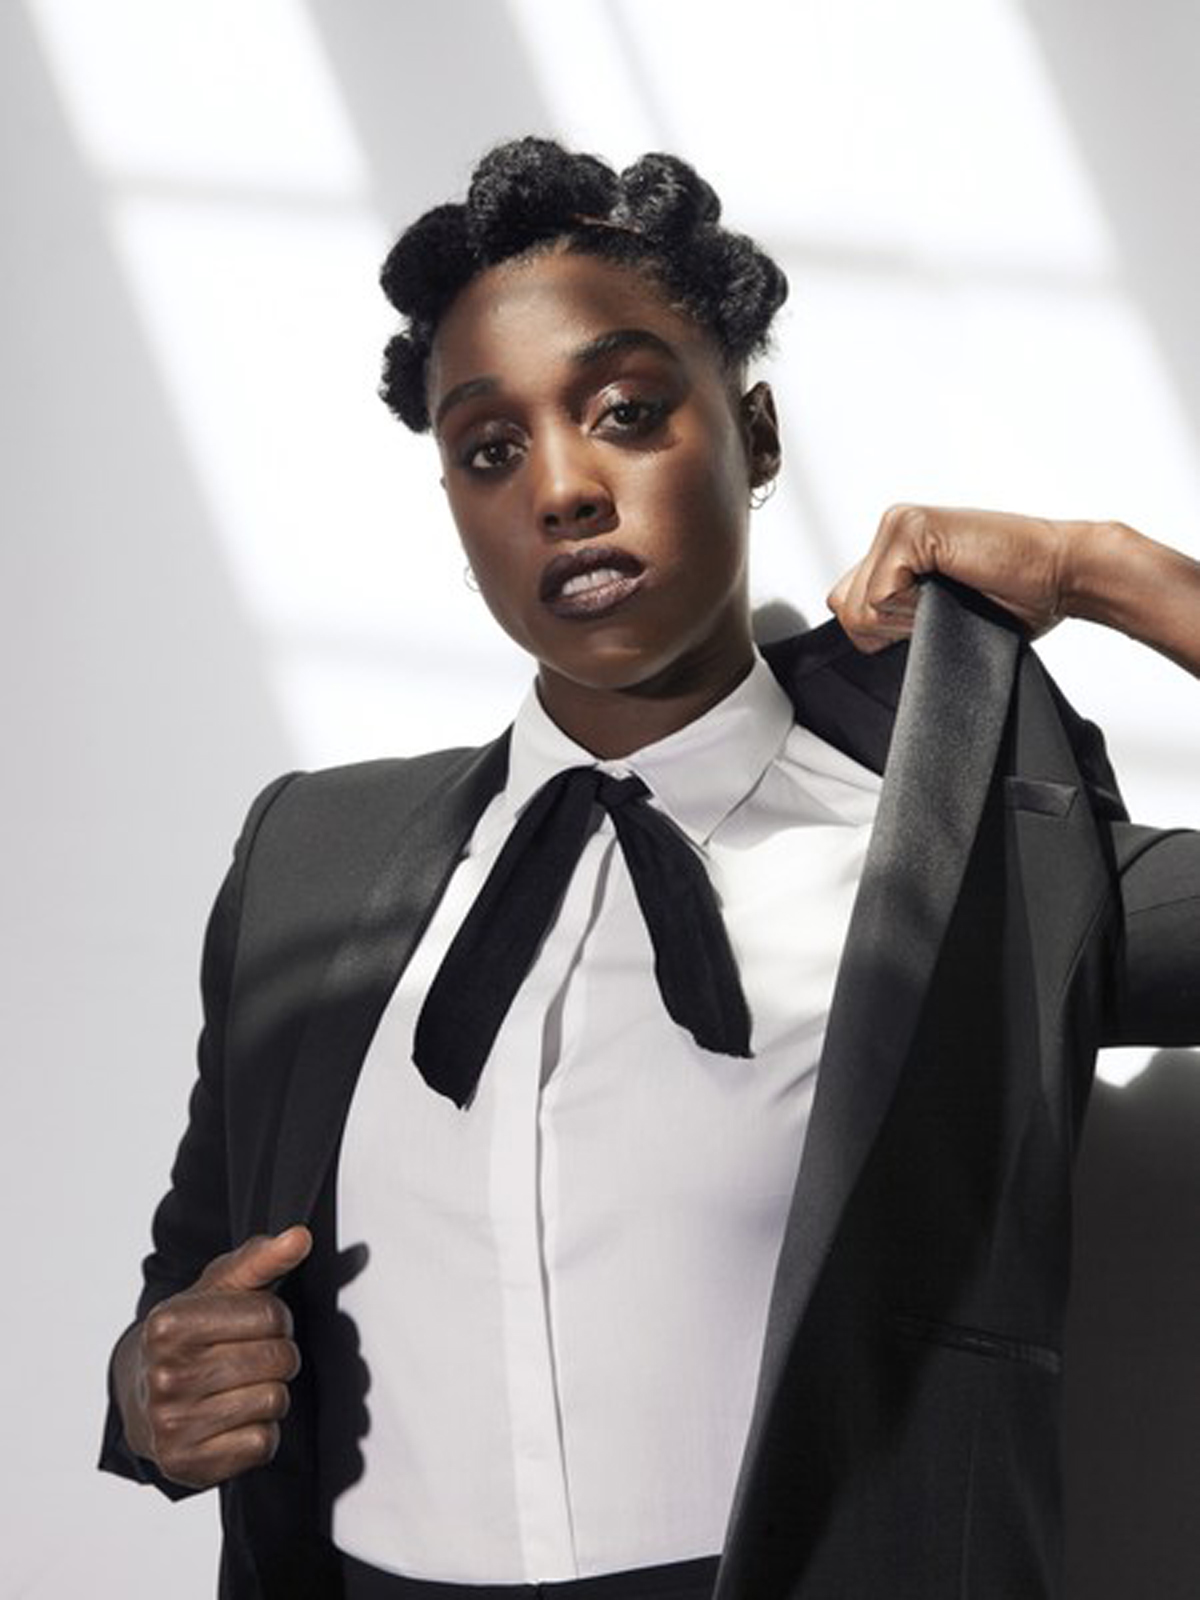 Lashana Lynch is the next 007 in new James Bond film.